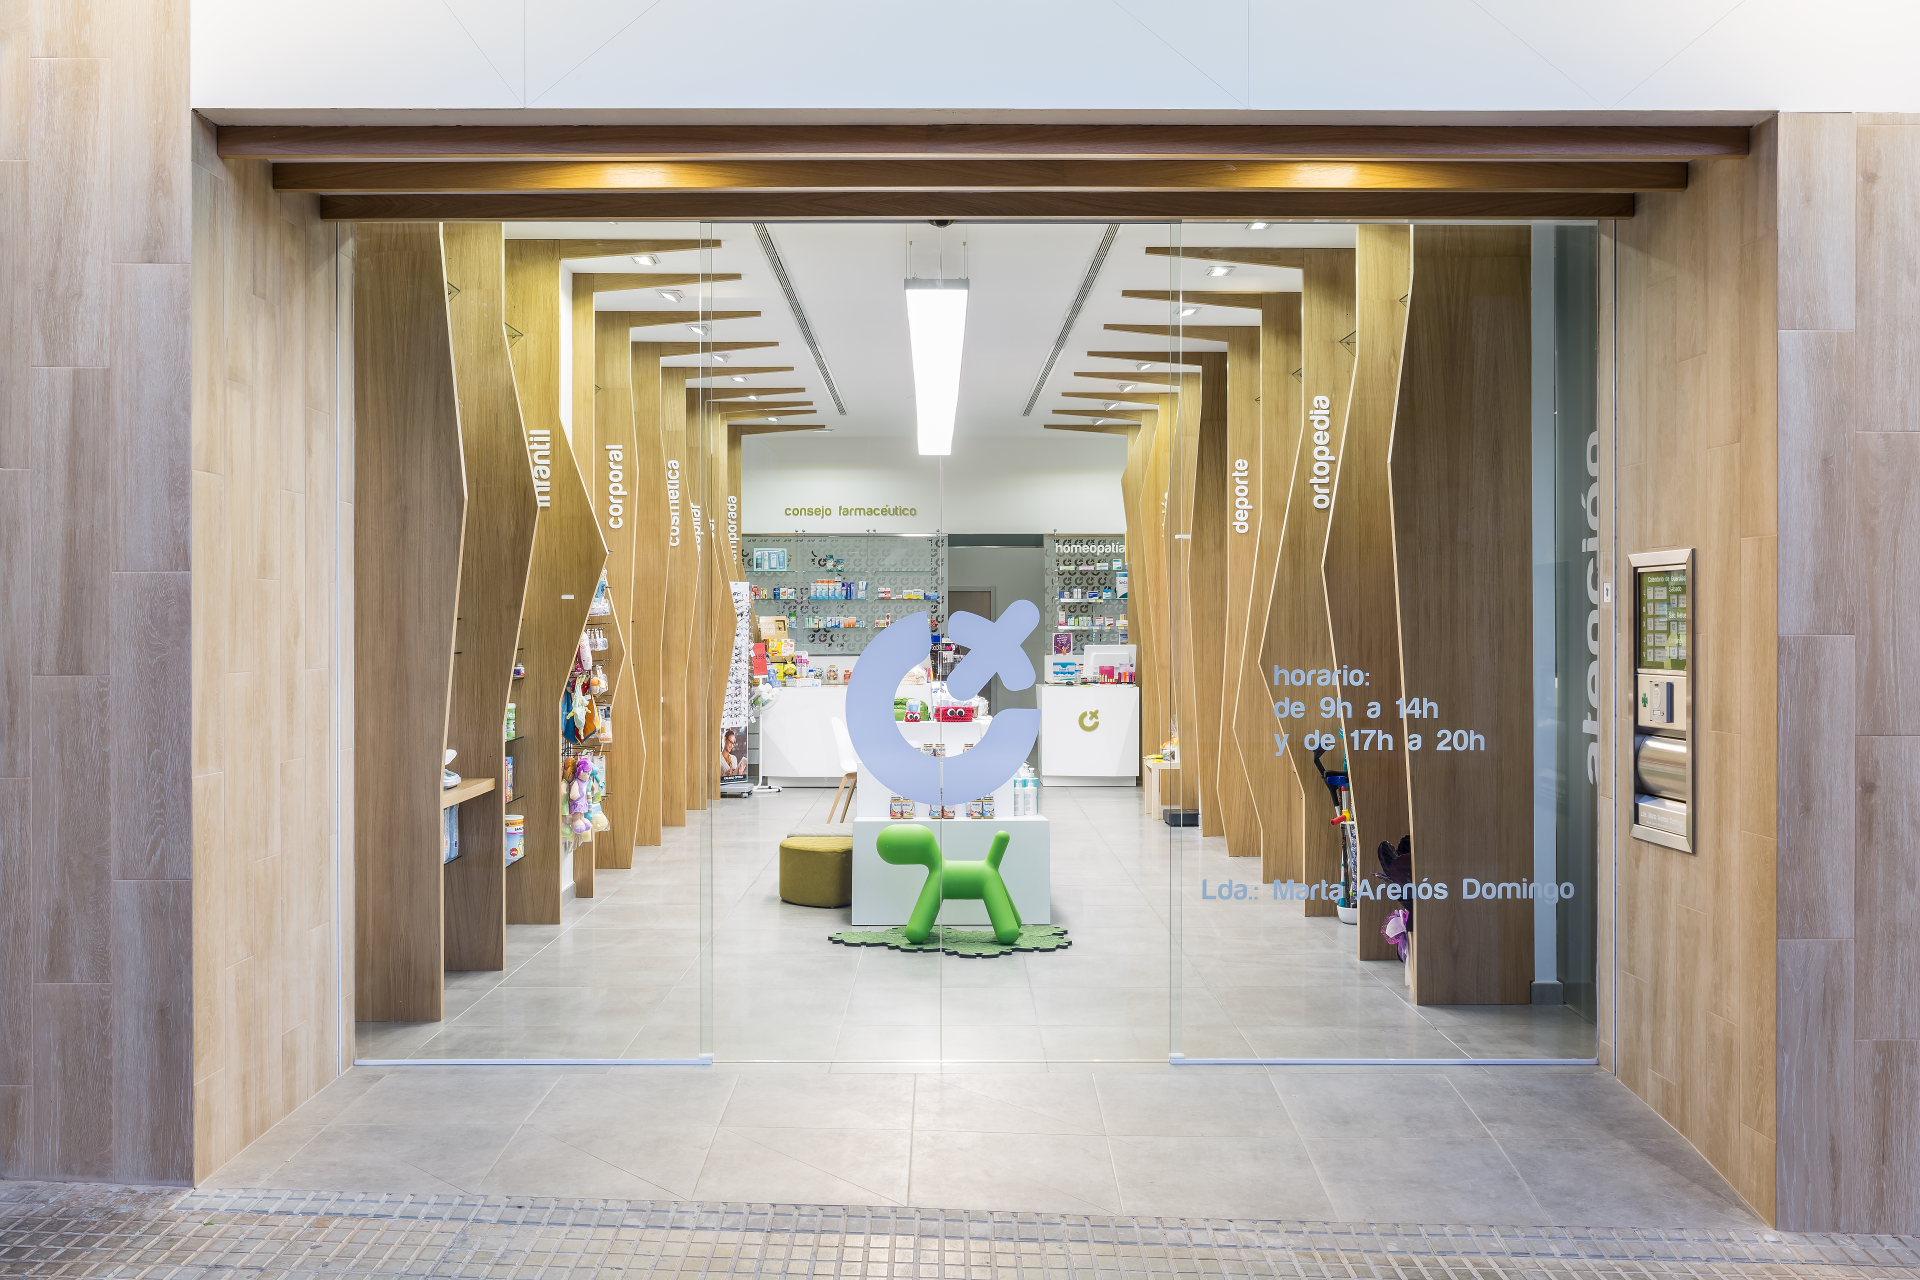 fotografia-arquitectura-valencia-german-cabo-d'estudio-farmacia-arenos-almassora-castellon (18)